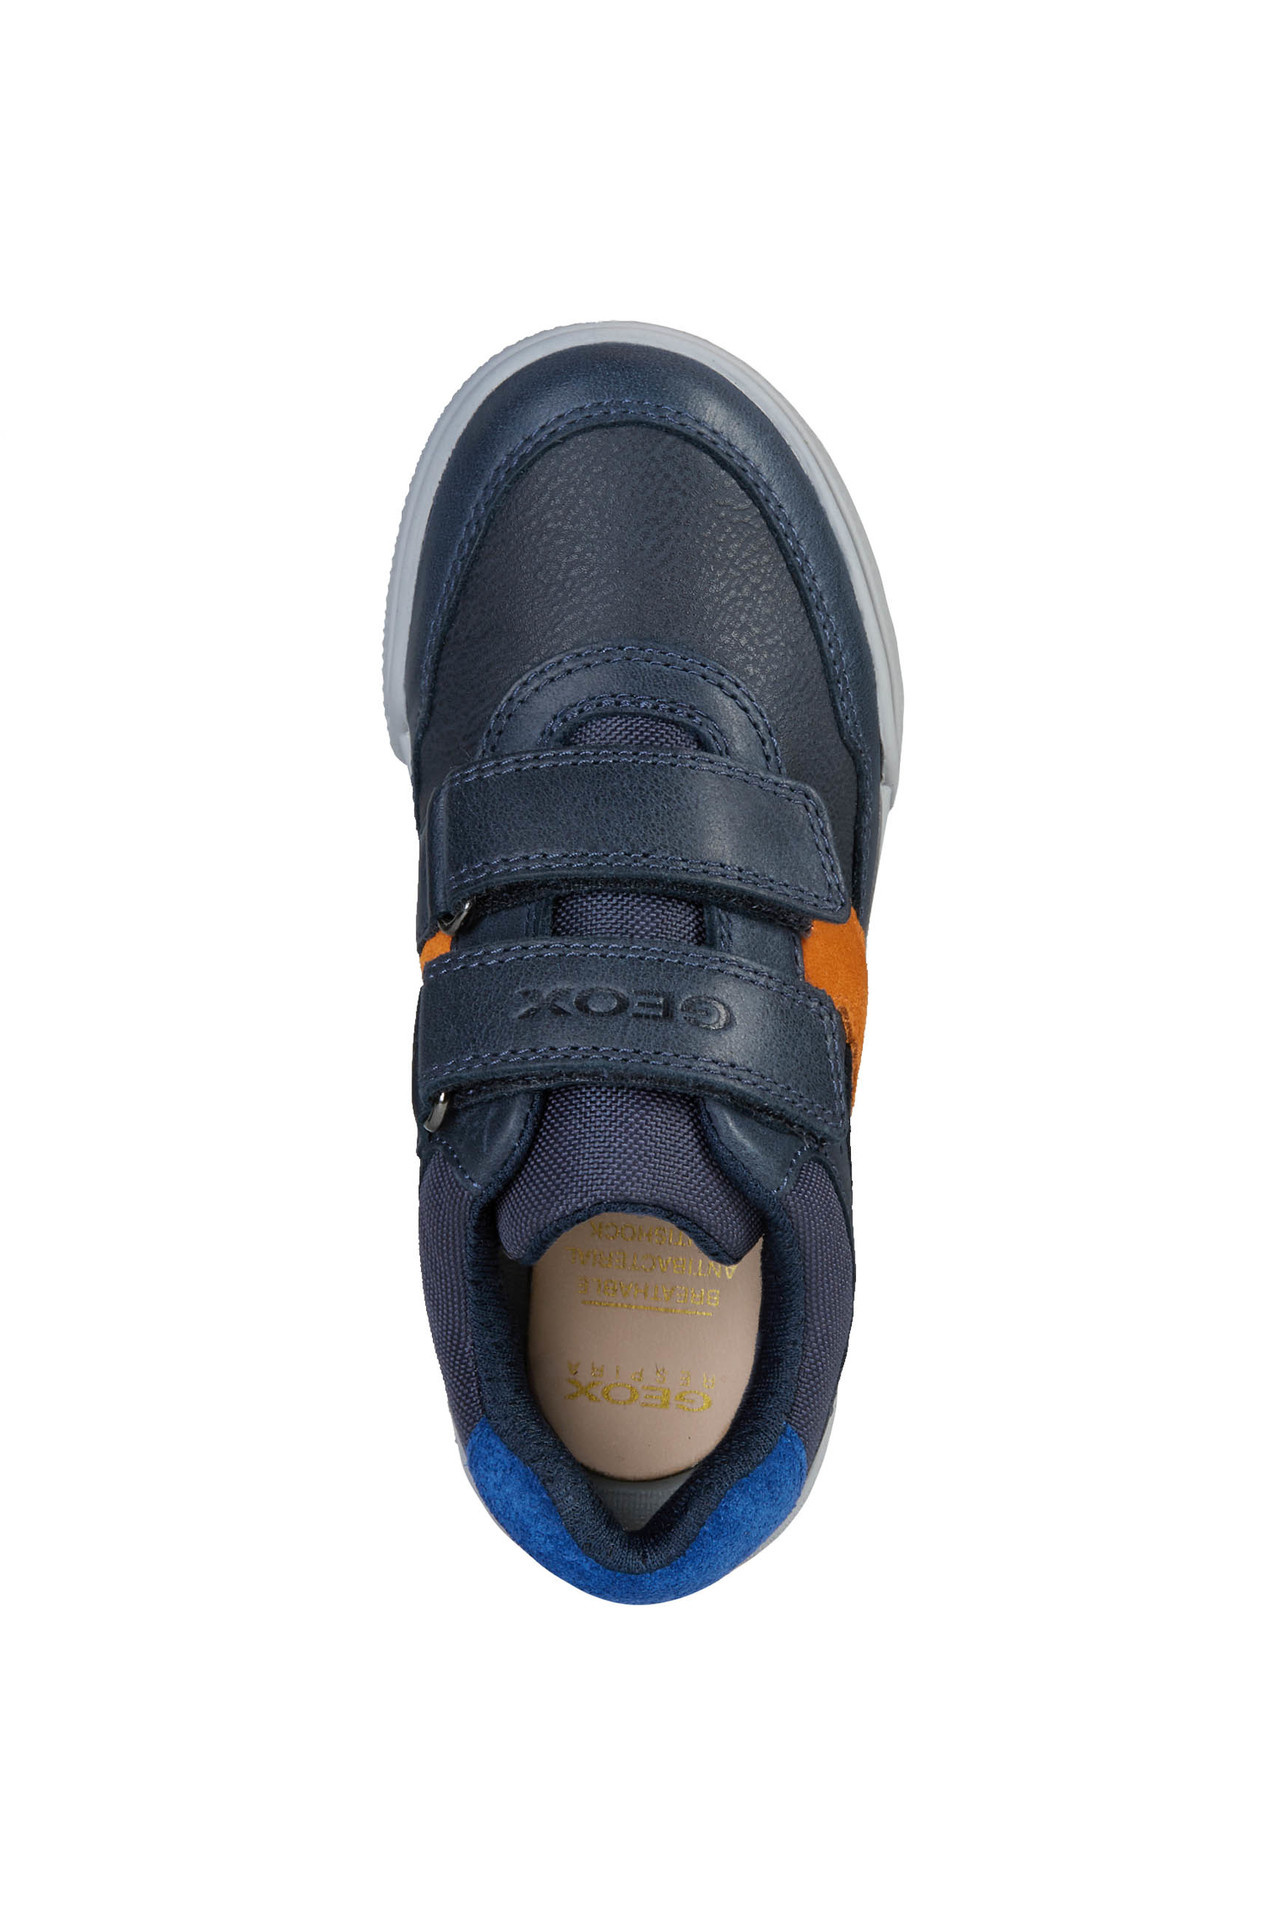 Geox Poseido Navy Orange